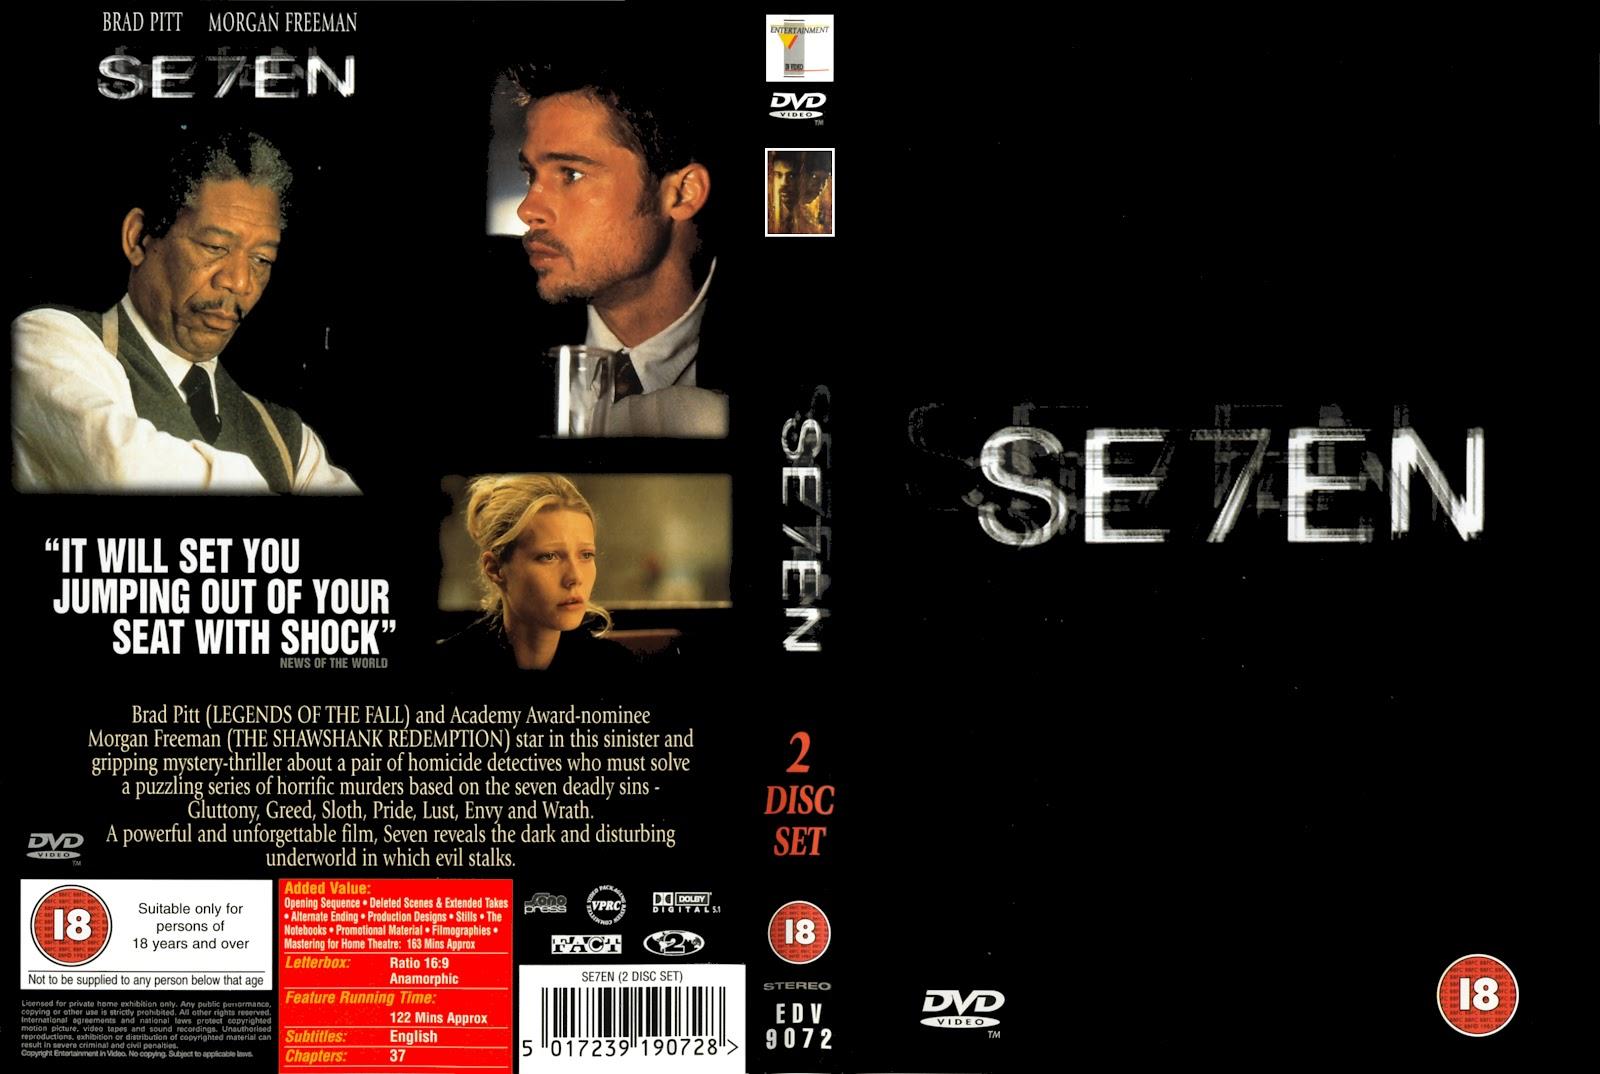 Se7en-Dvd-Cover